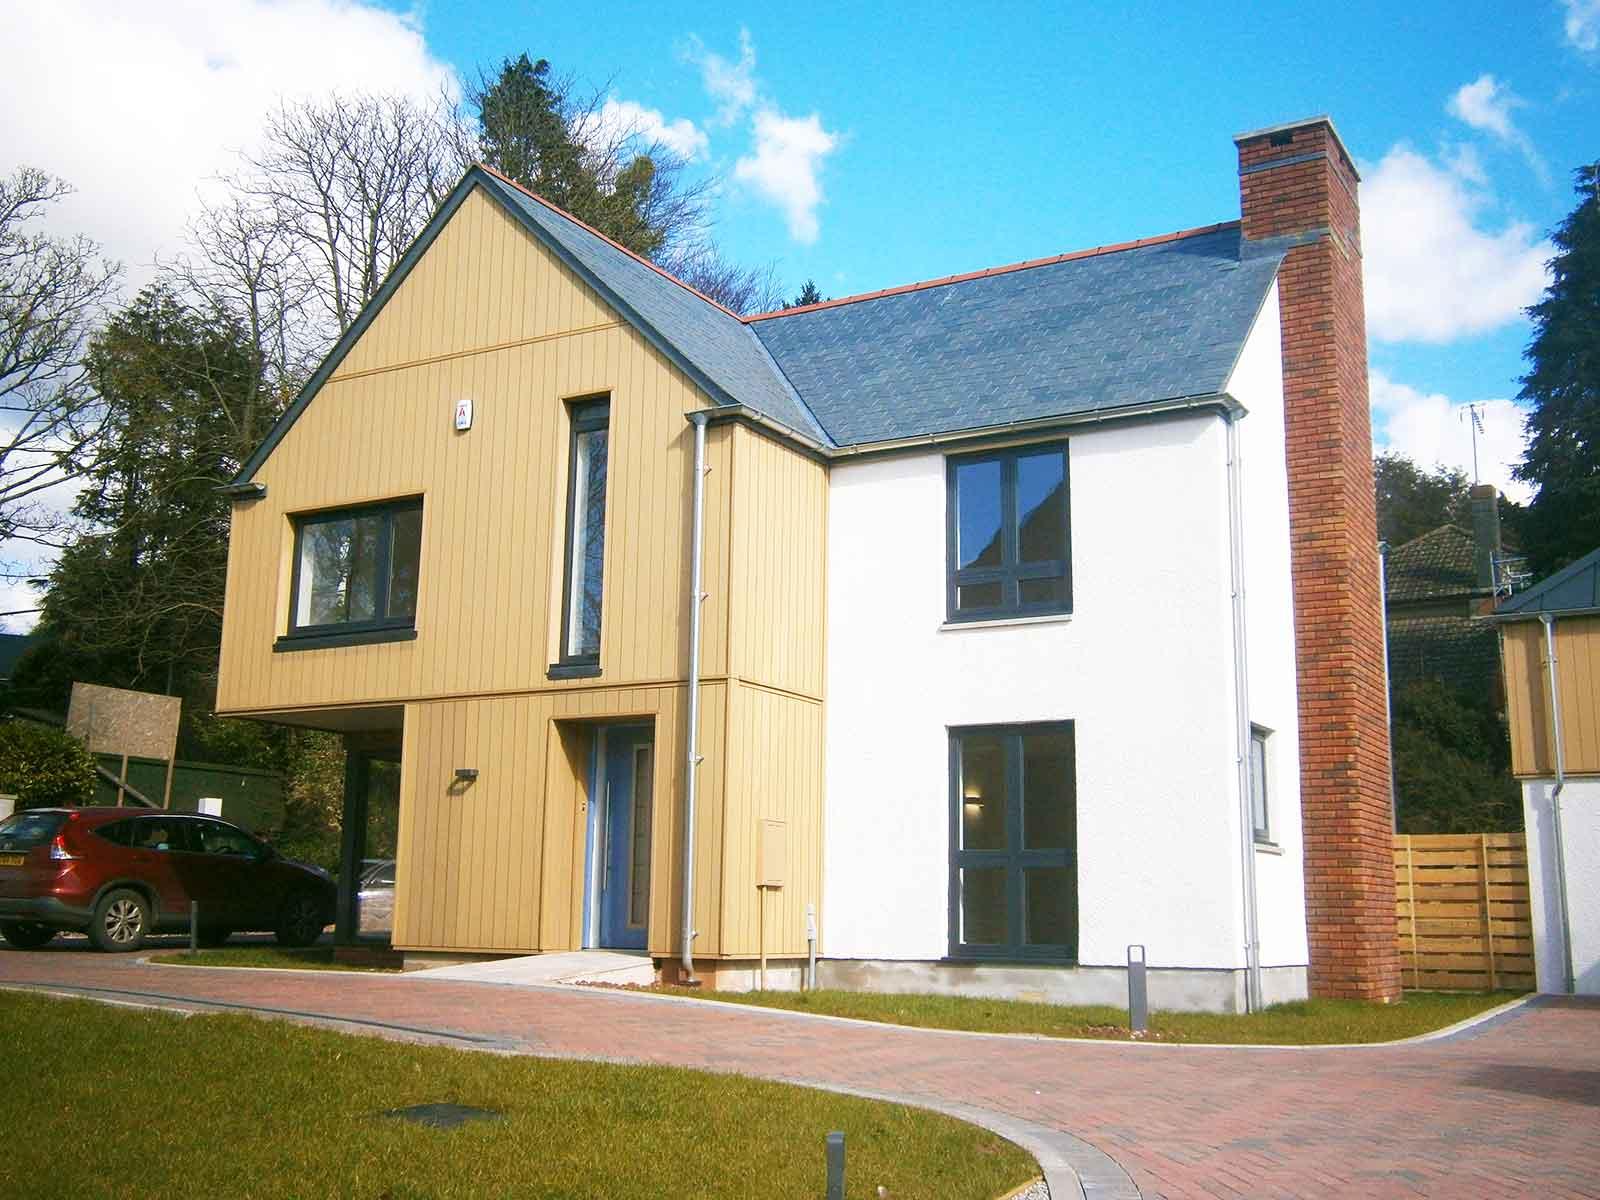 New dwelling design in Totnes